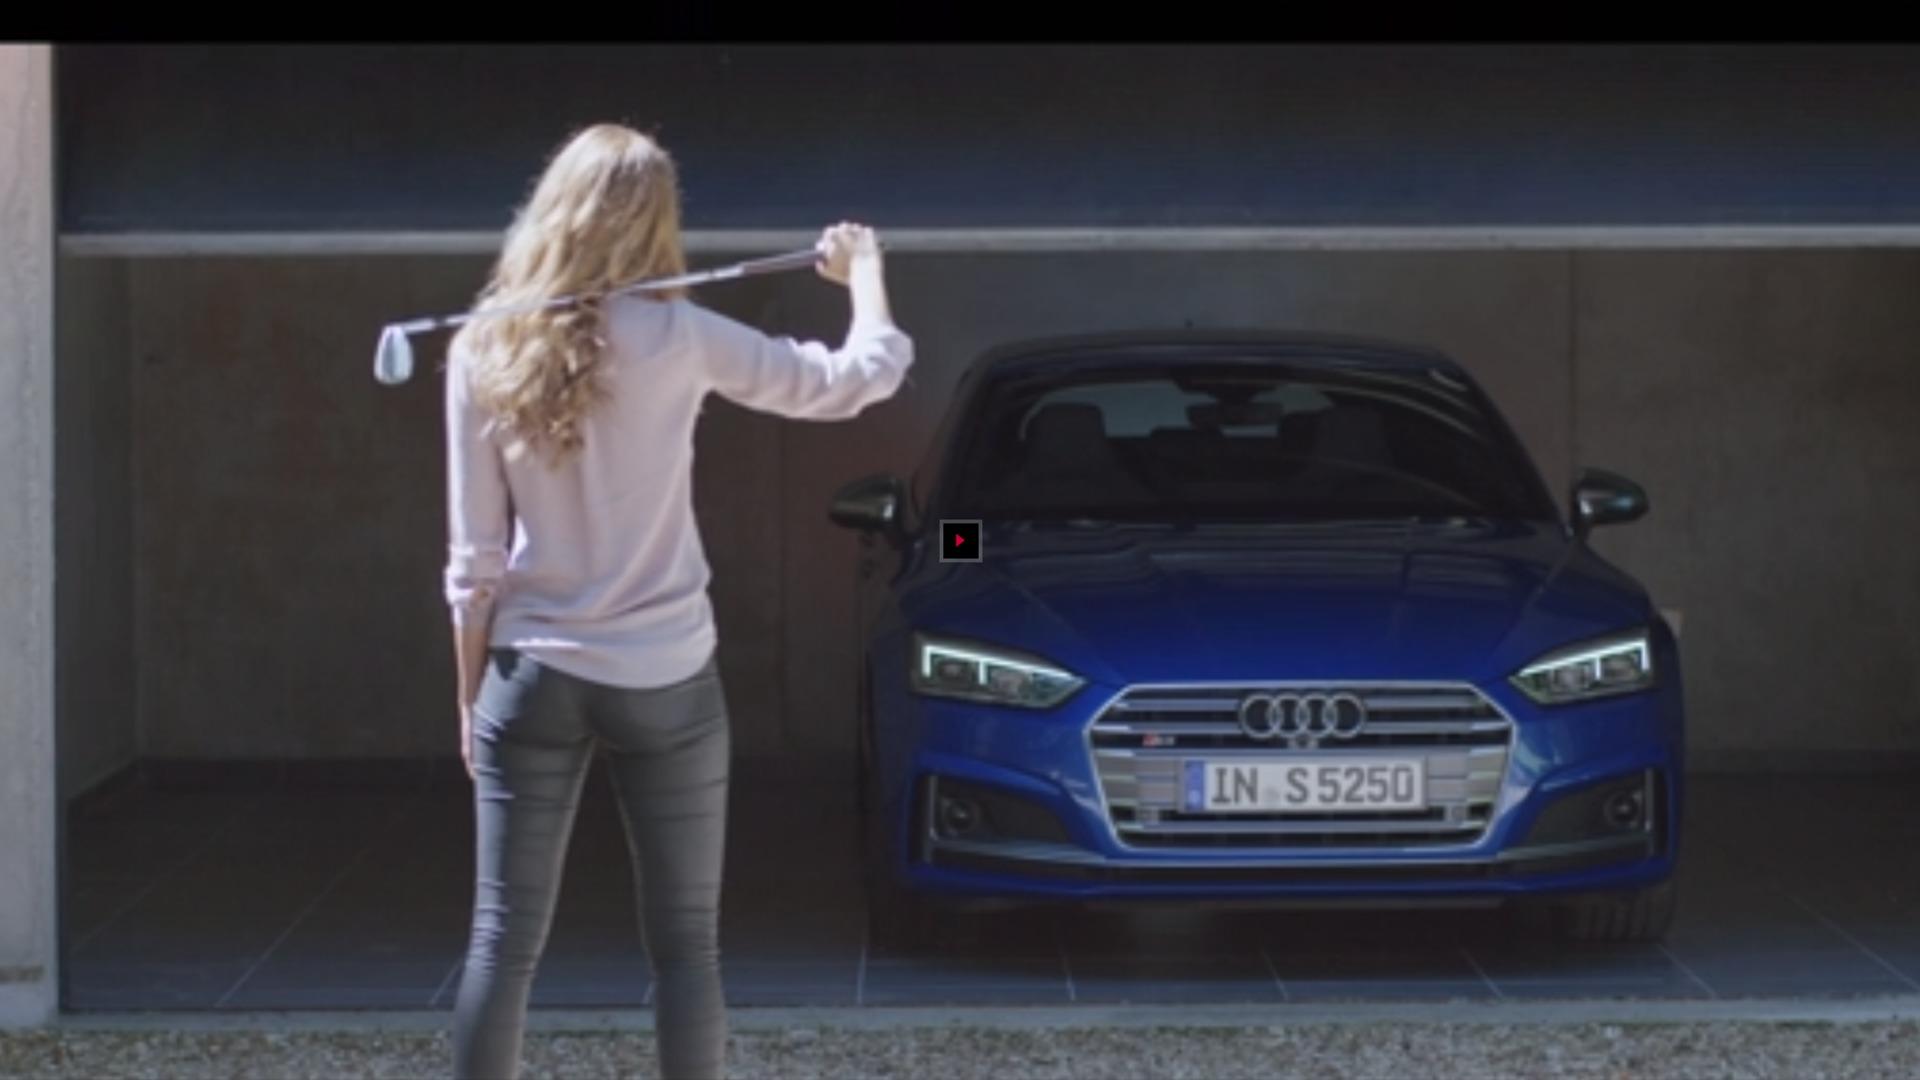 The Audi S5 Sportback